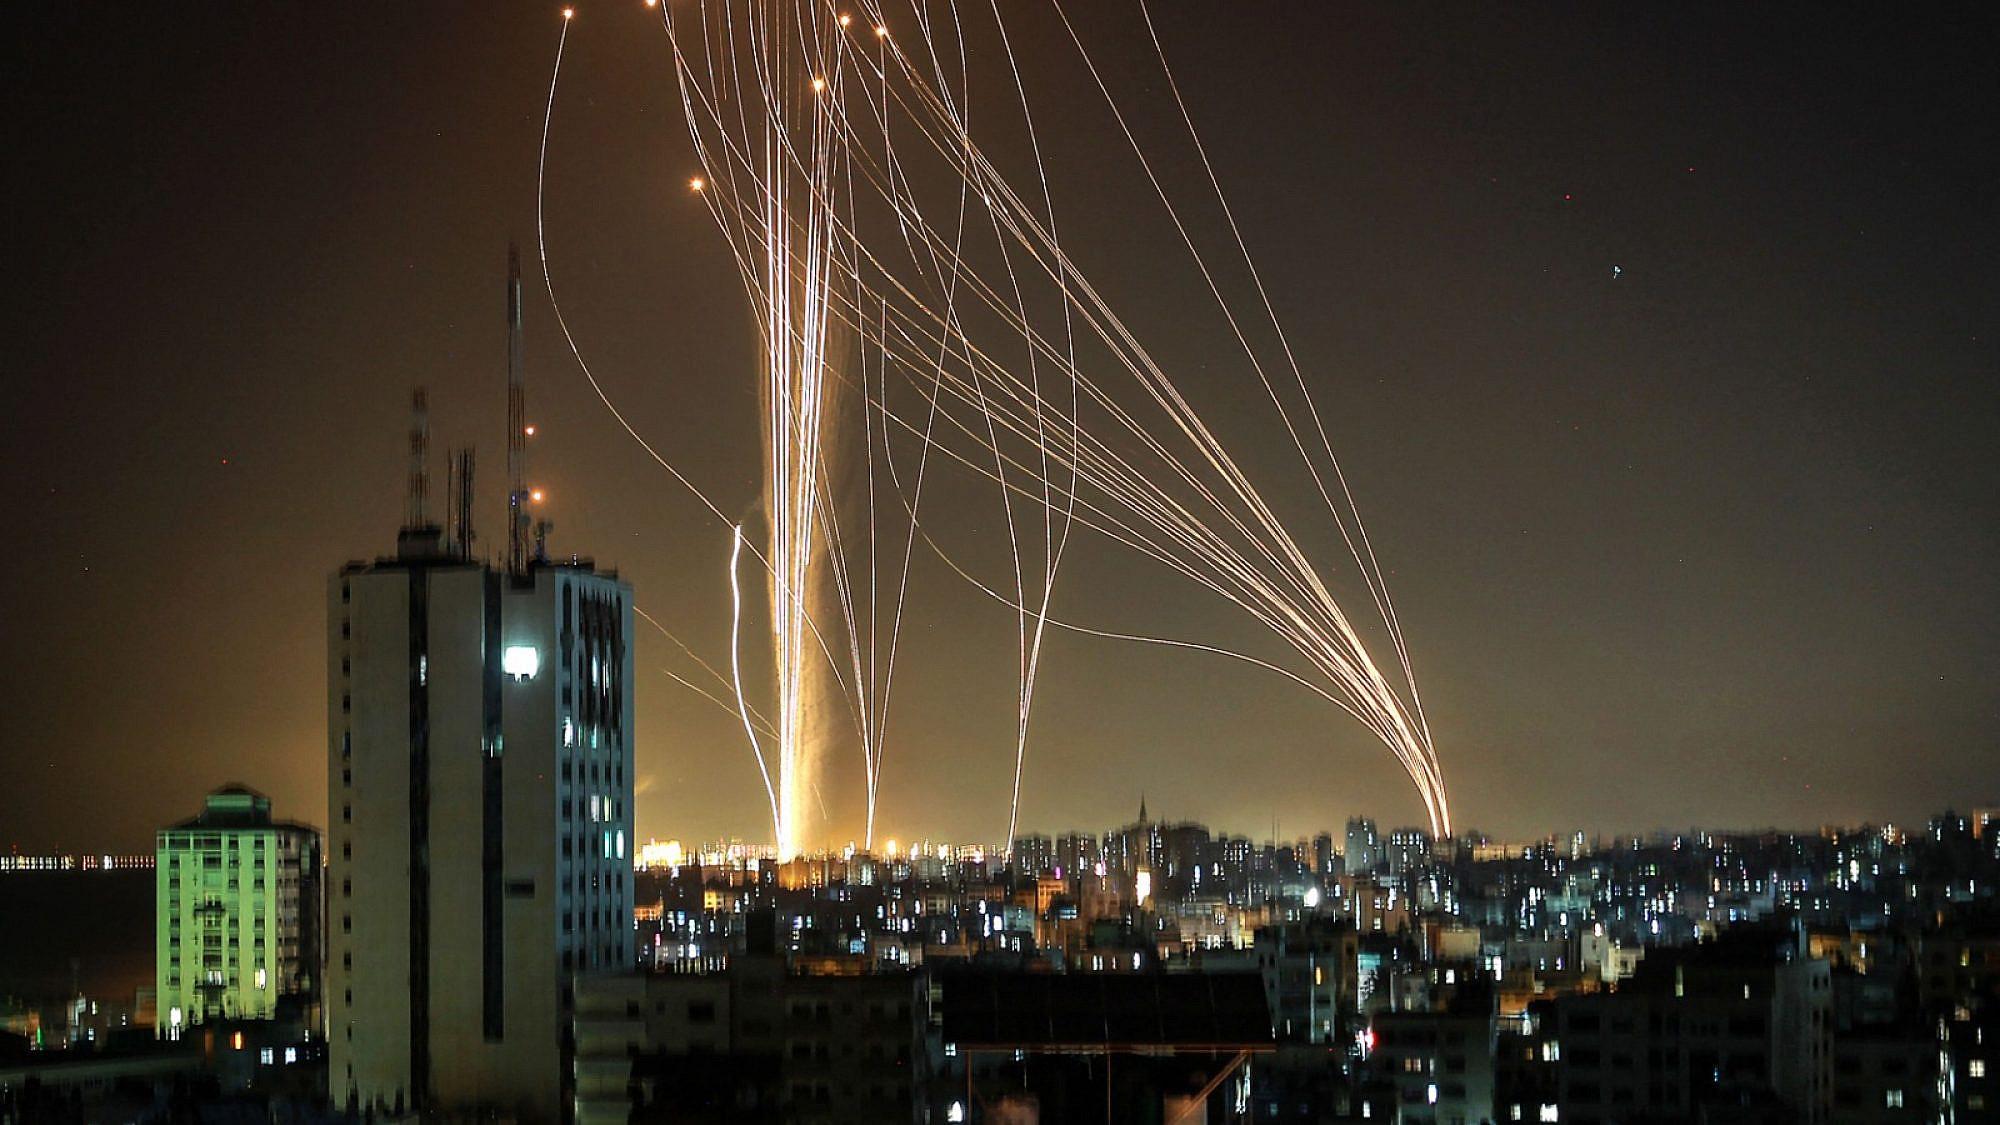 שיגורים מעזה, הערב. צילום: אנאס באבא\AFP\גטי אימג'ס